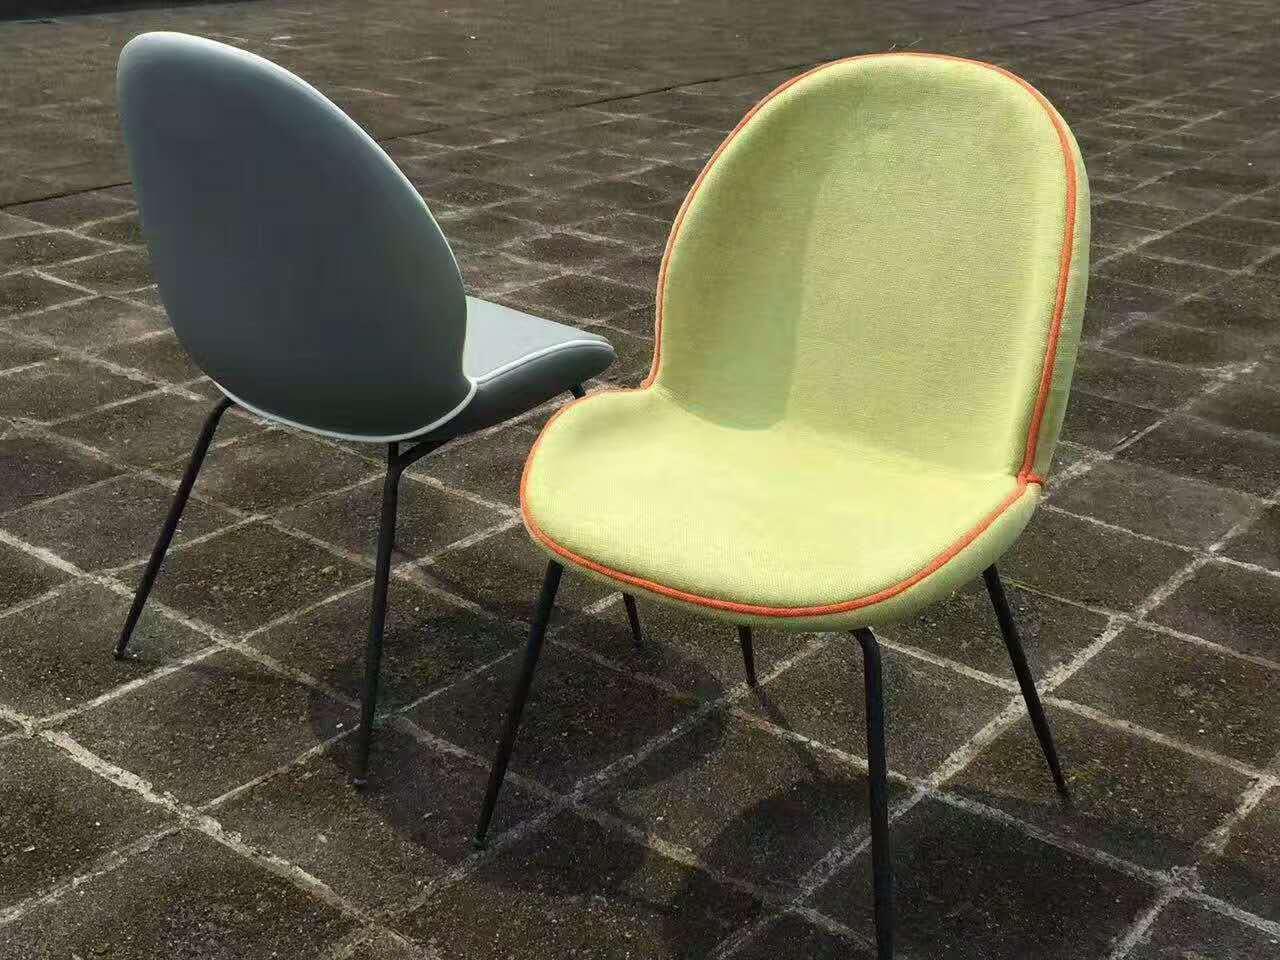 hot sale modern style dining chair restaurant chair